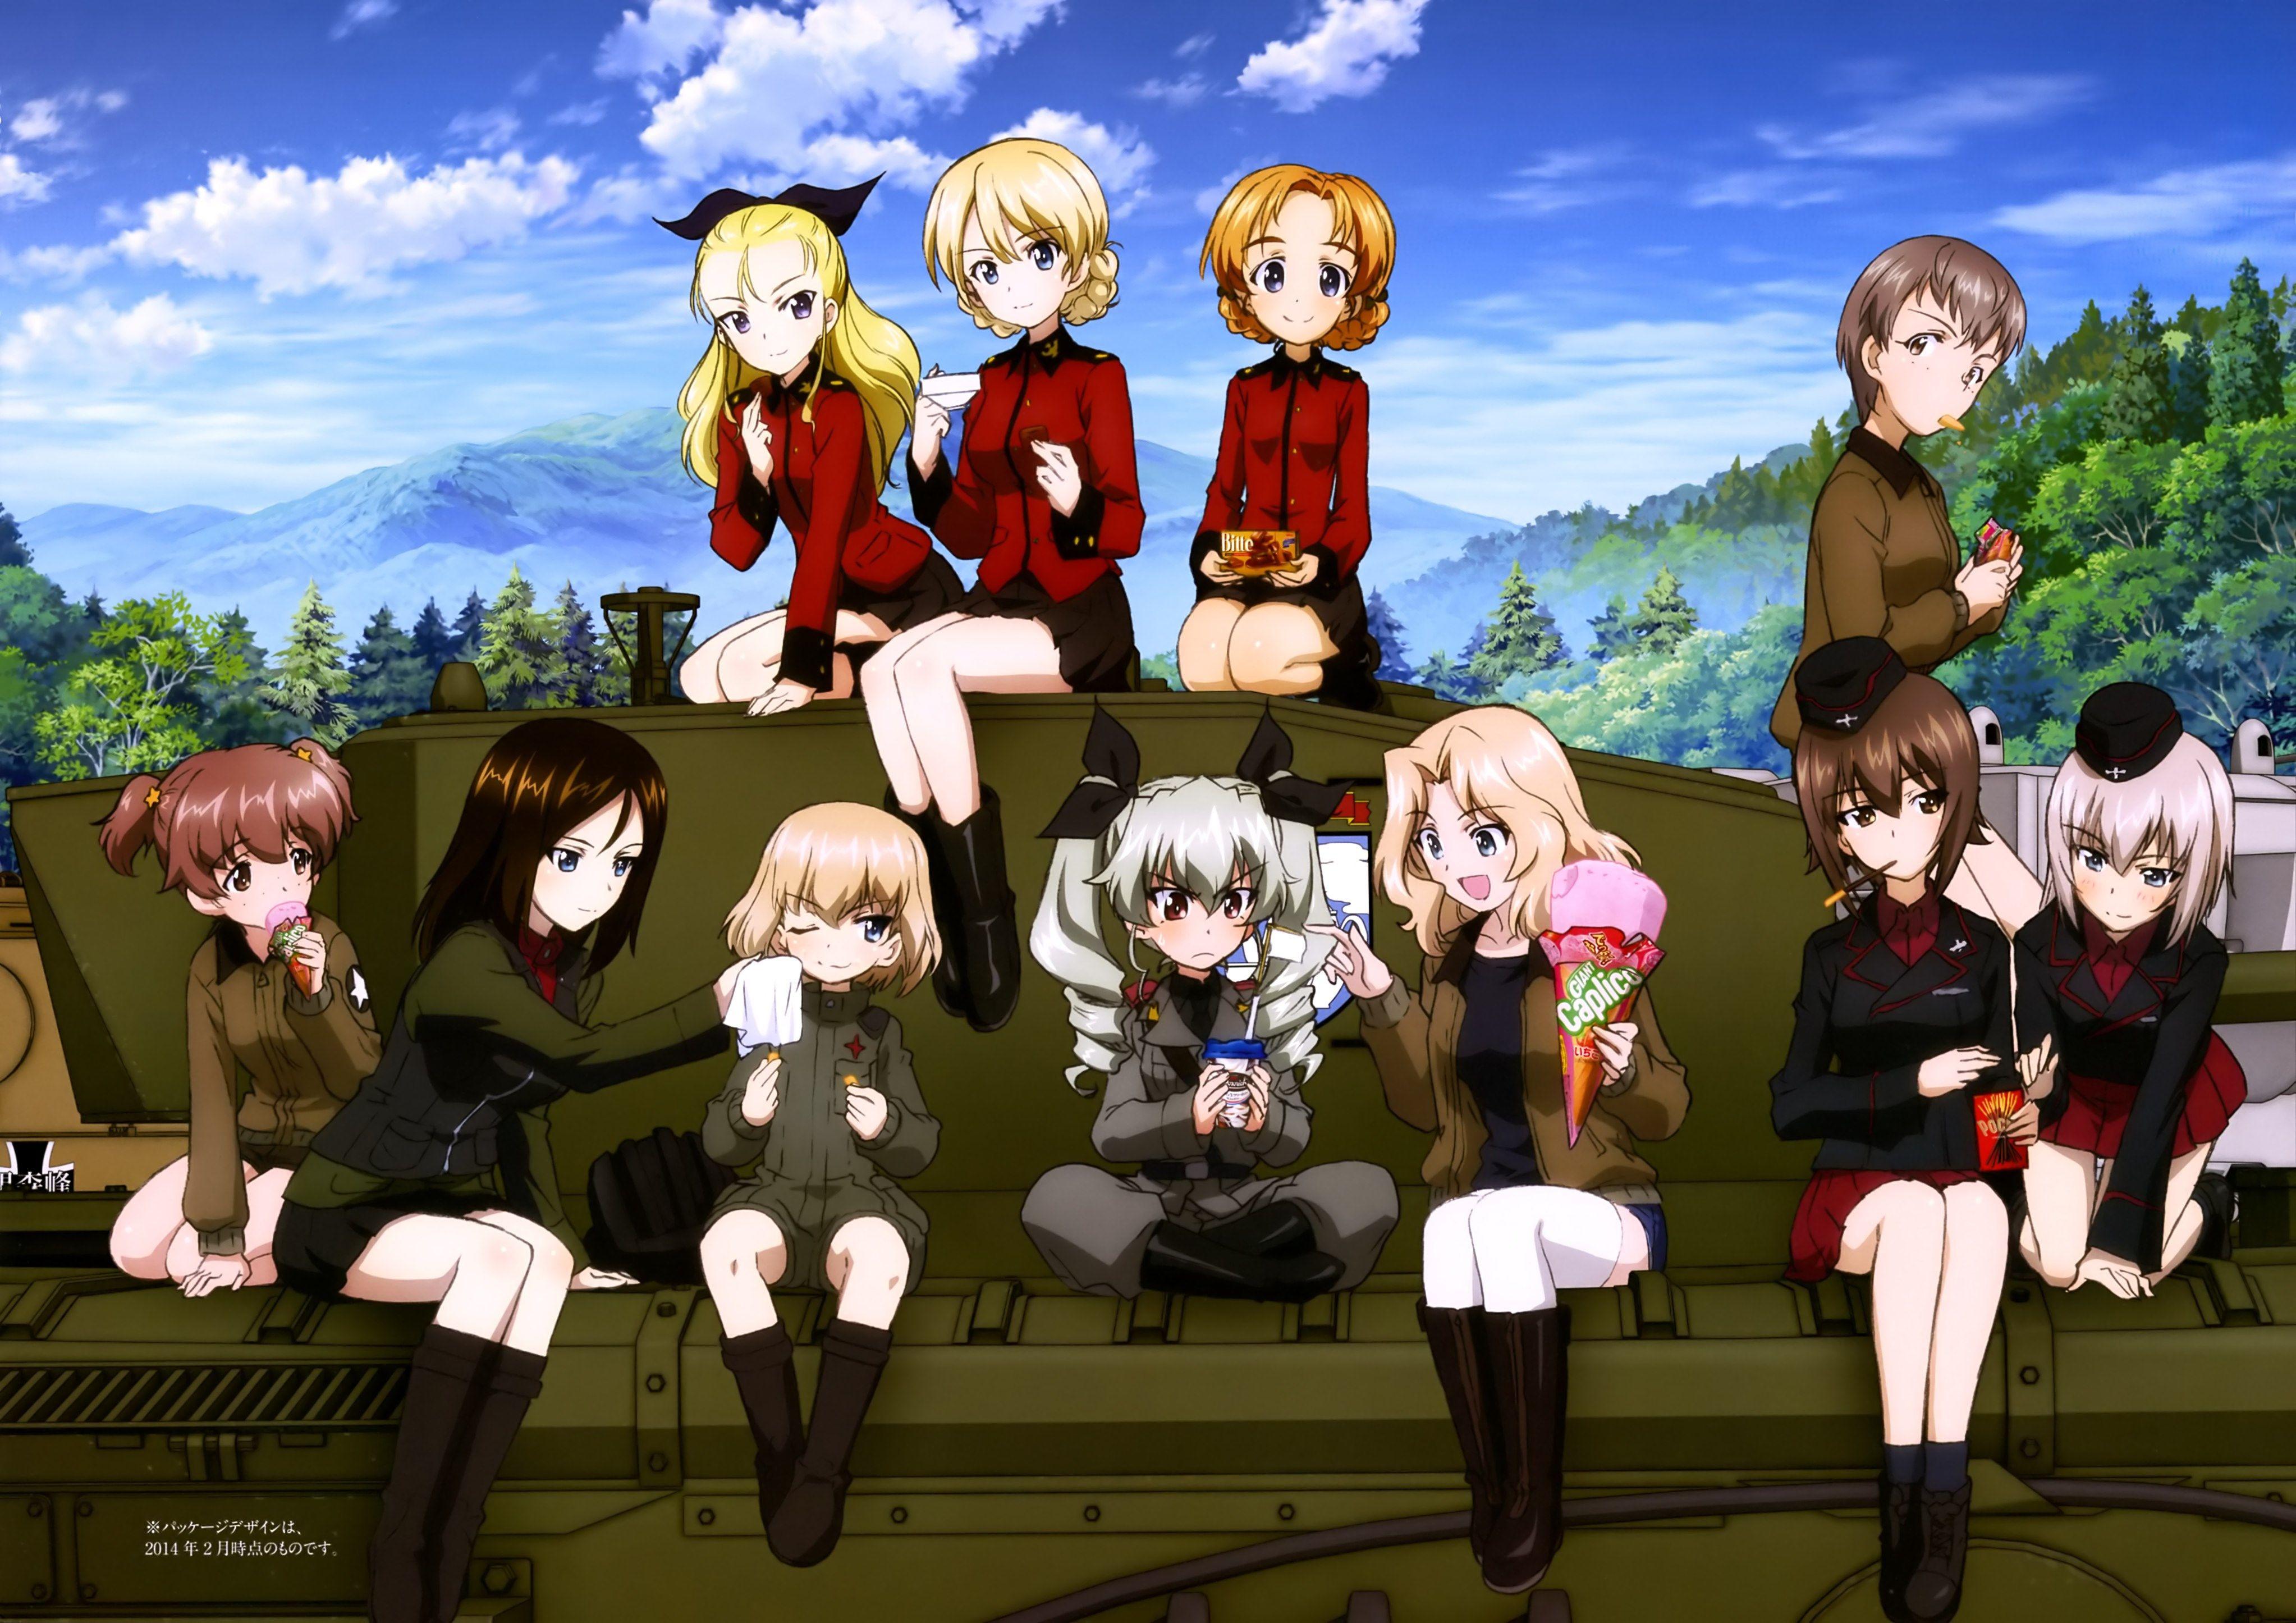 4k Wallpaper Girls Und Panzer 4091x2891 かわいいアニメの女の子